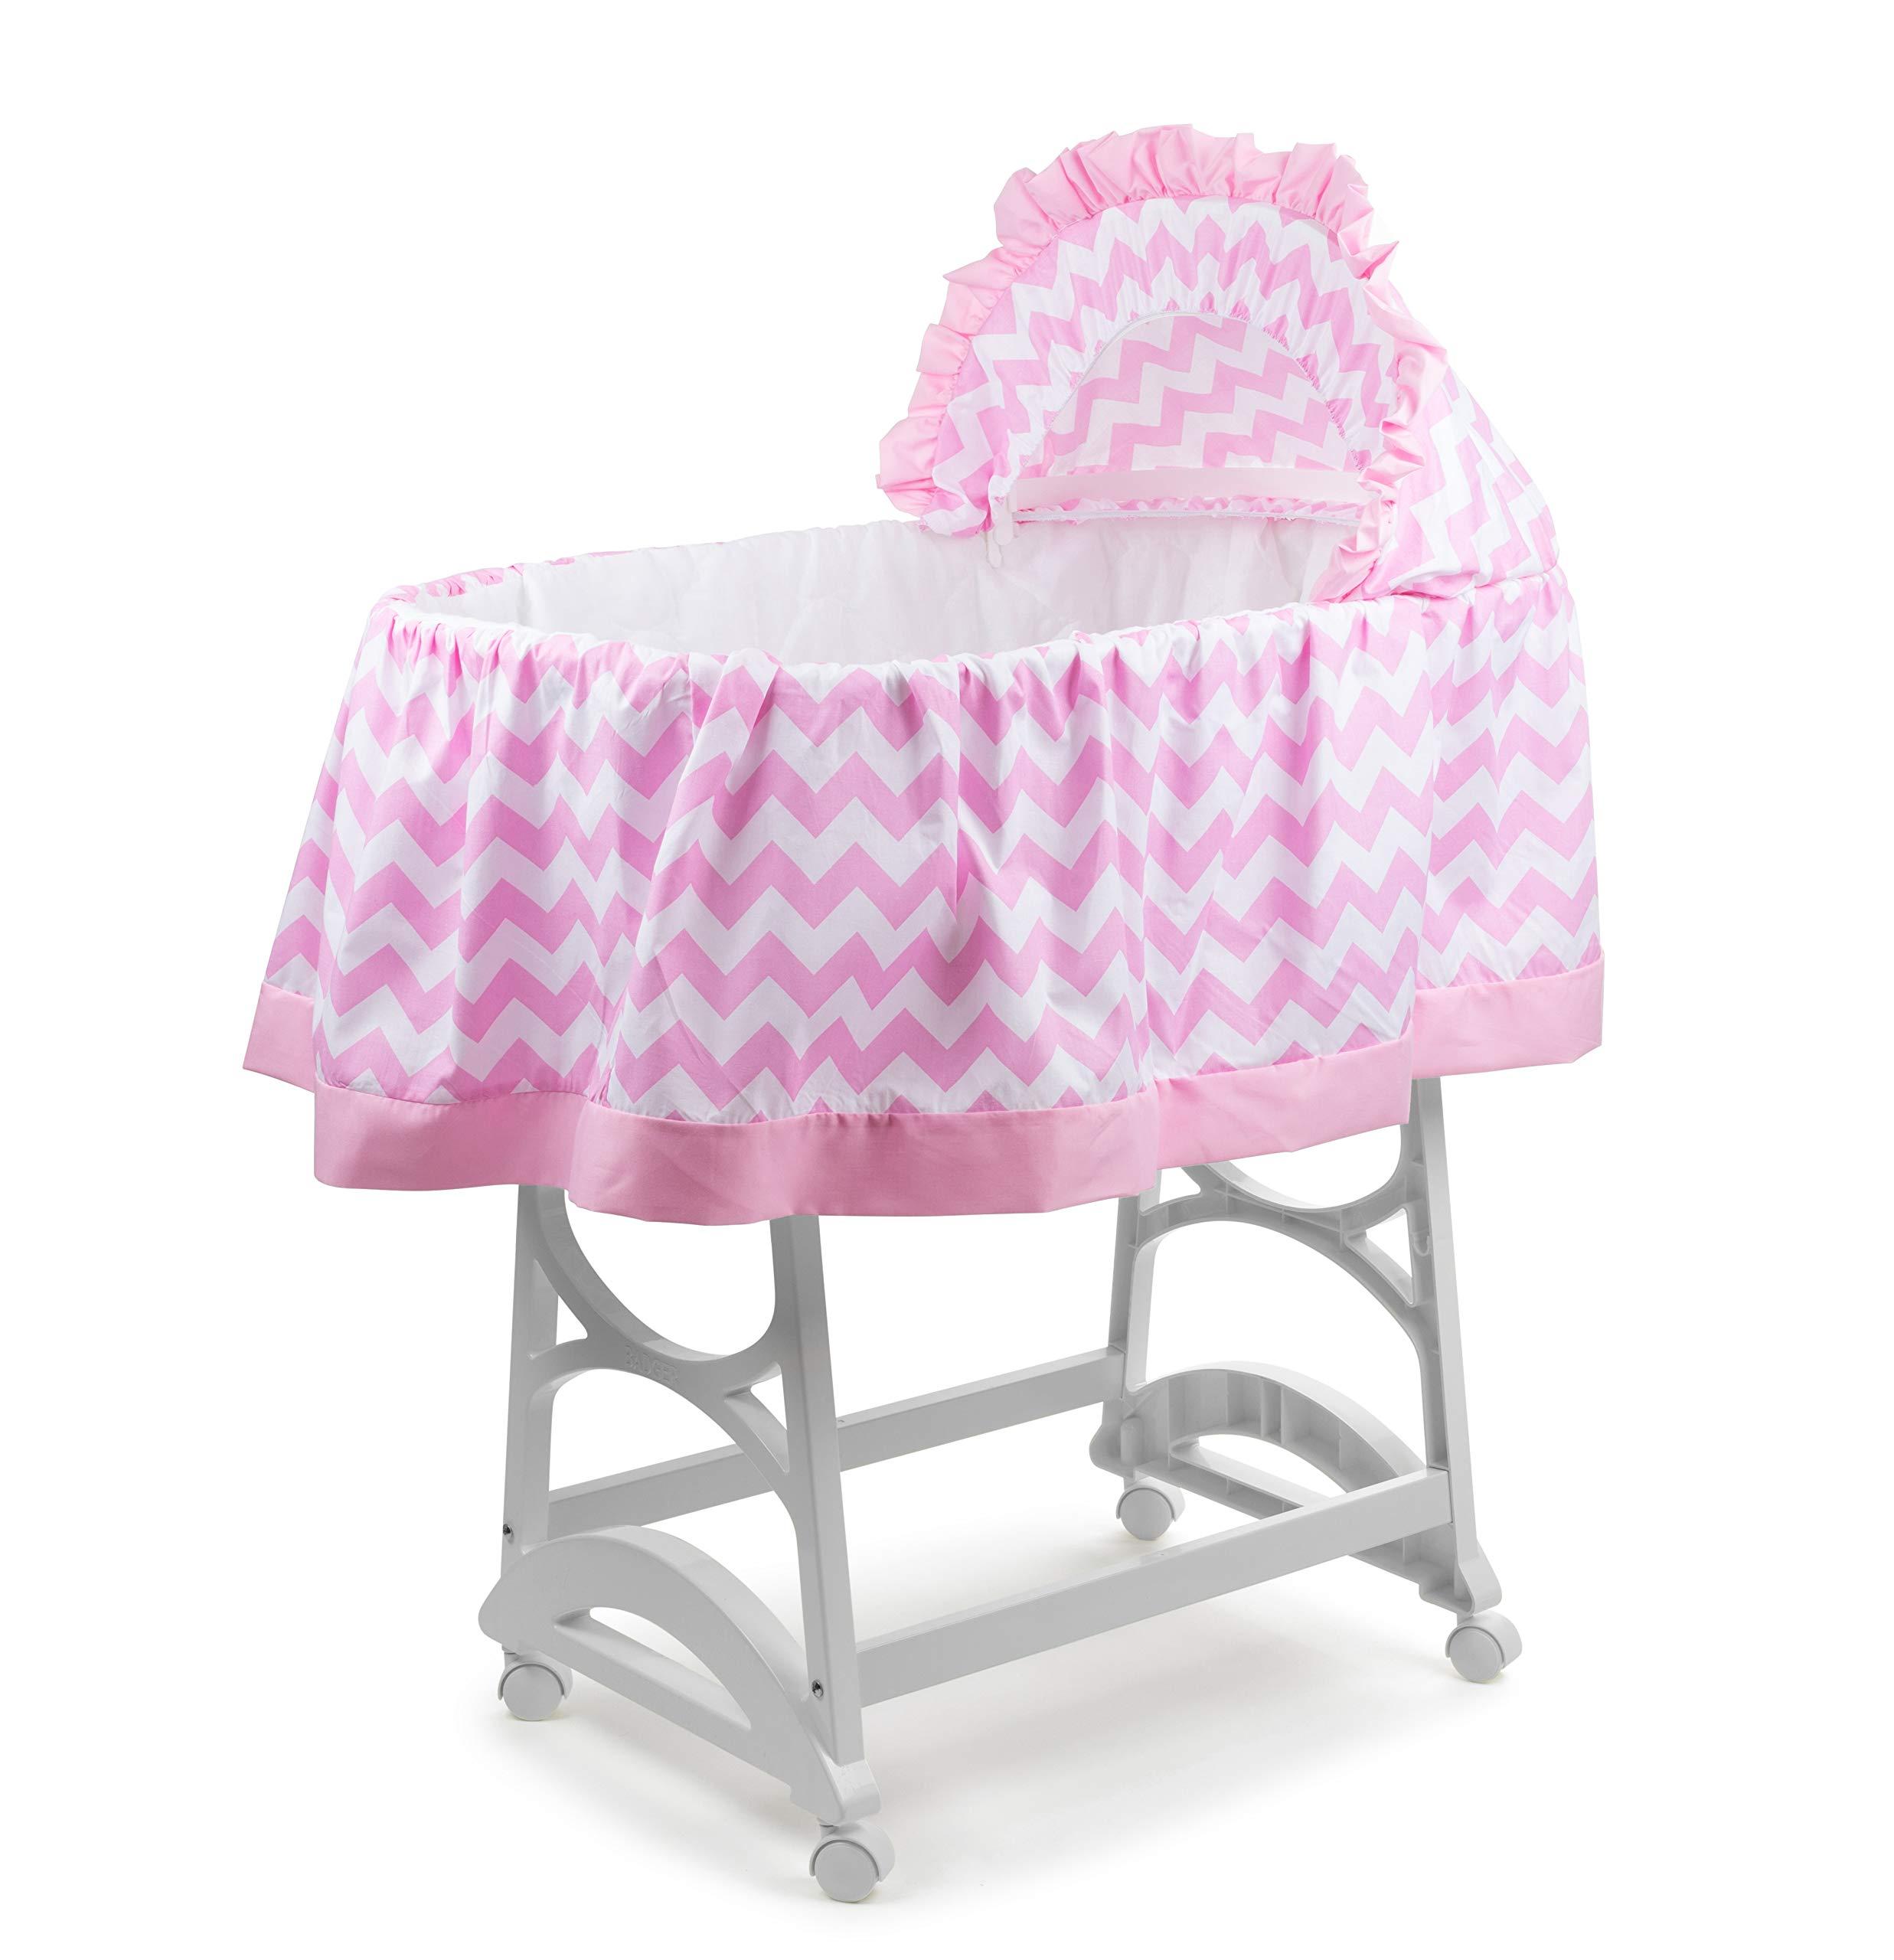 aBaby Chevron Short Bassinet Skirt, Pink, Small